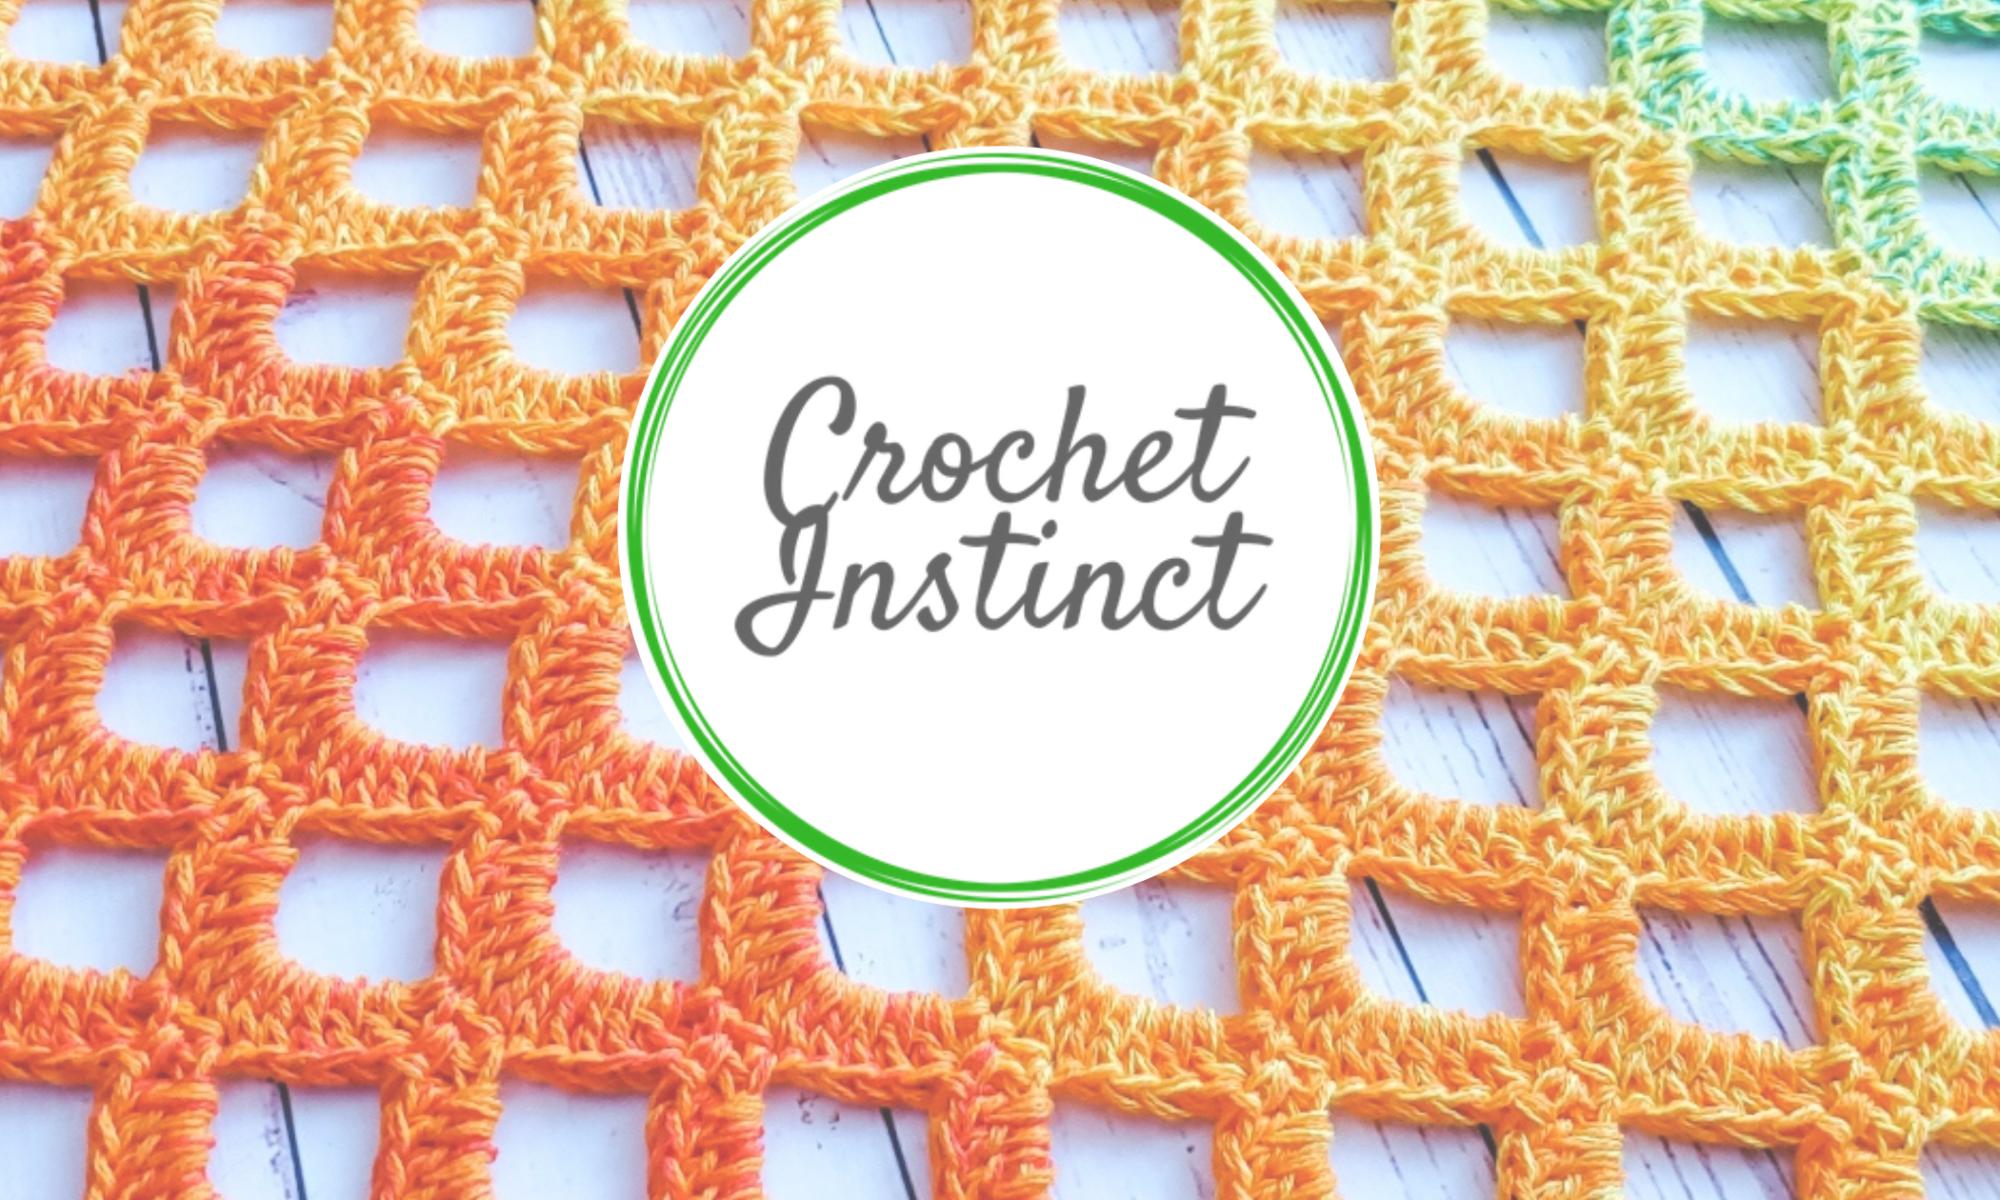 Crochet Instinct A Penchant For Crochet